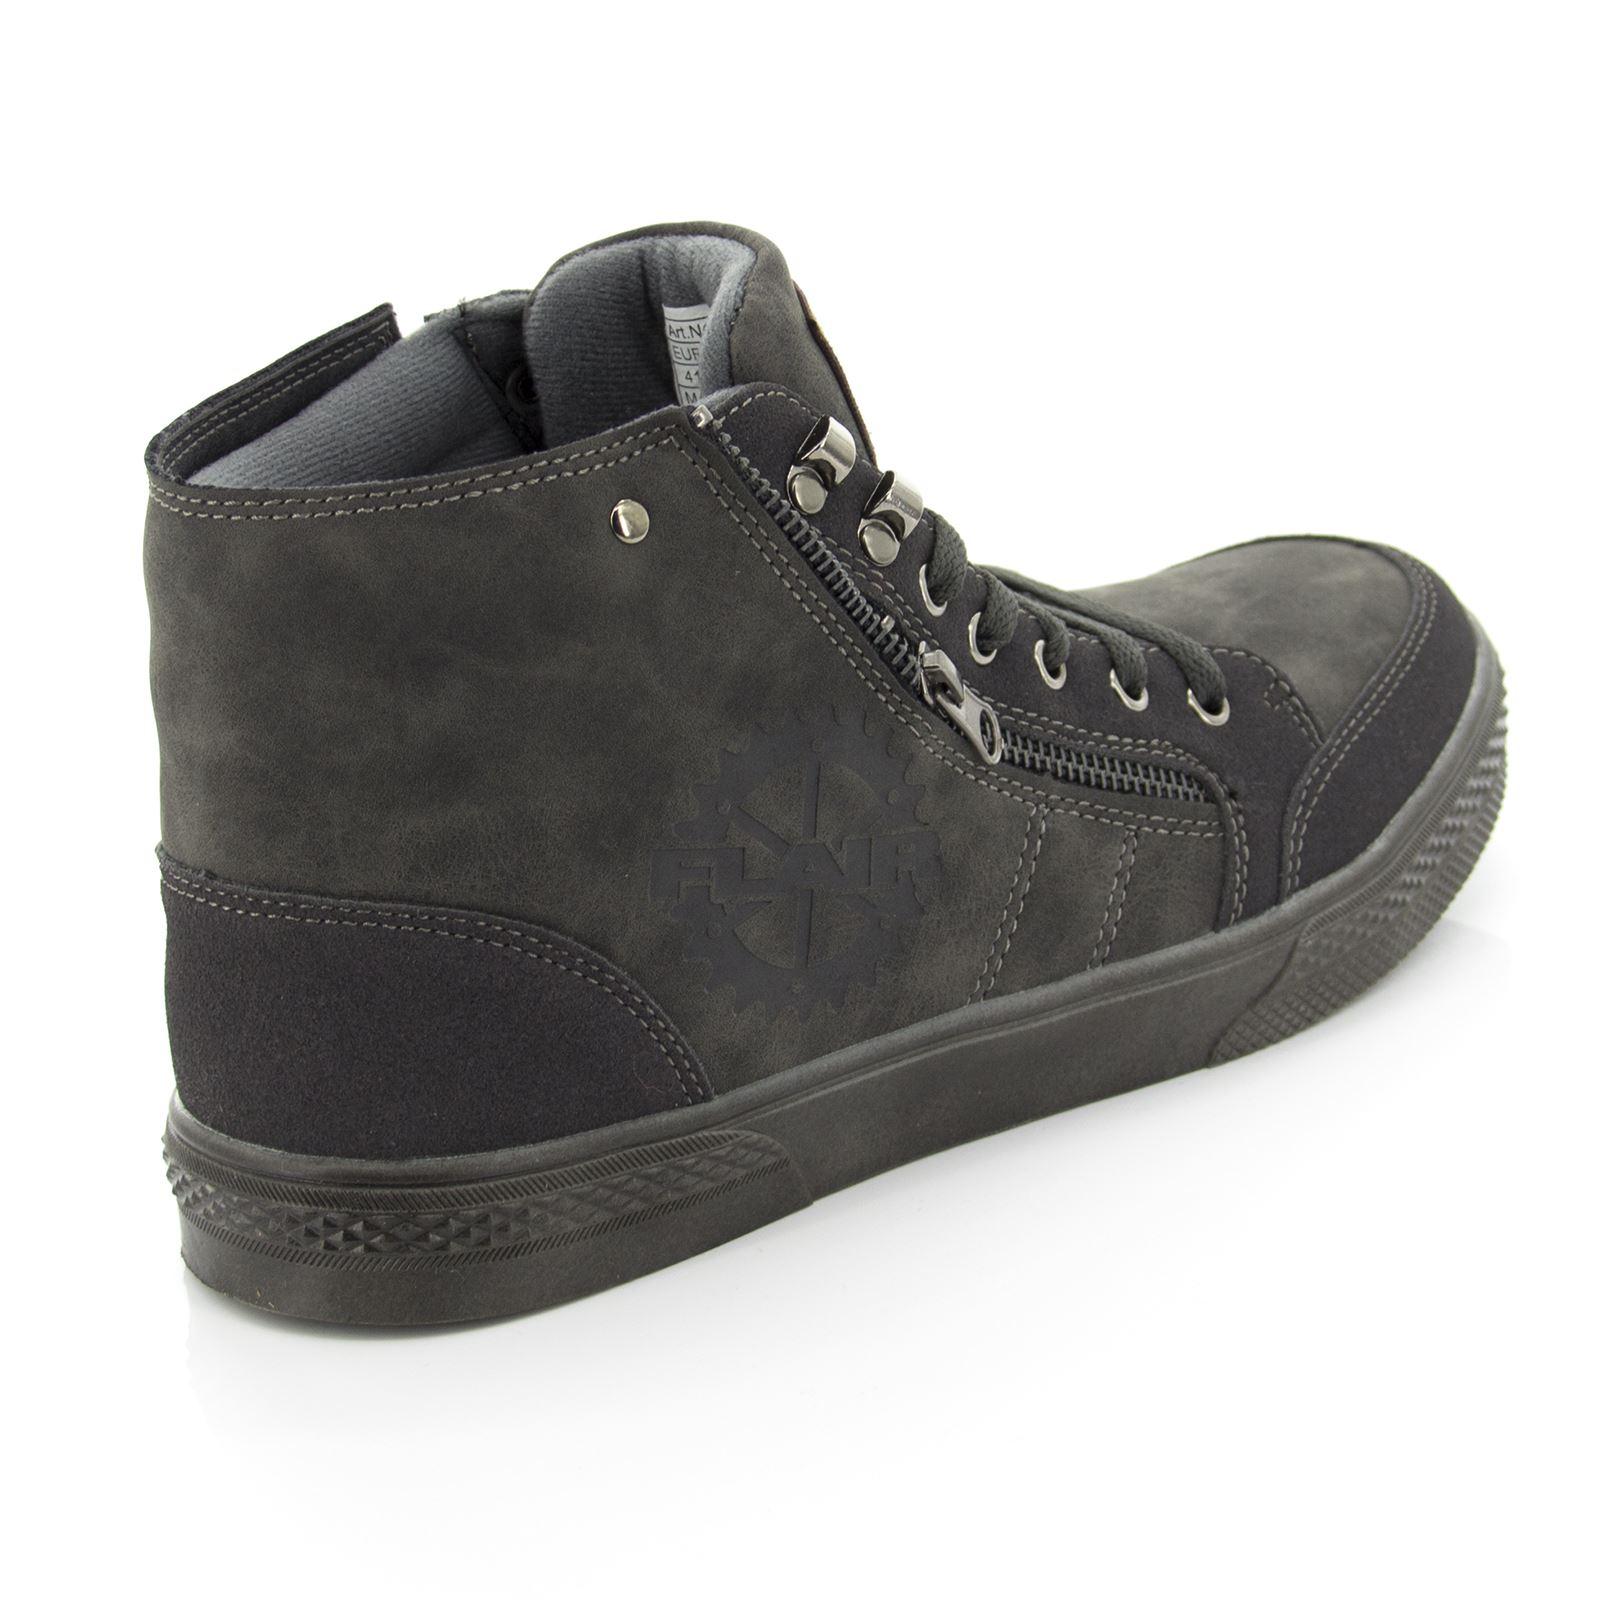 Scarpe Uomo Sneakers Pelle PU Stivali Francesine Ginnastica Anfibi Nuove DXVXojJ